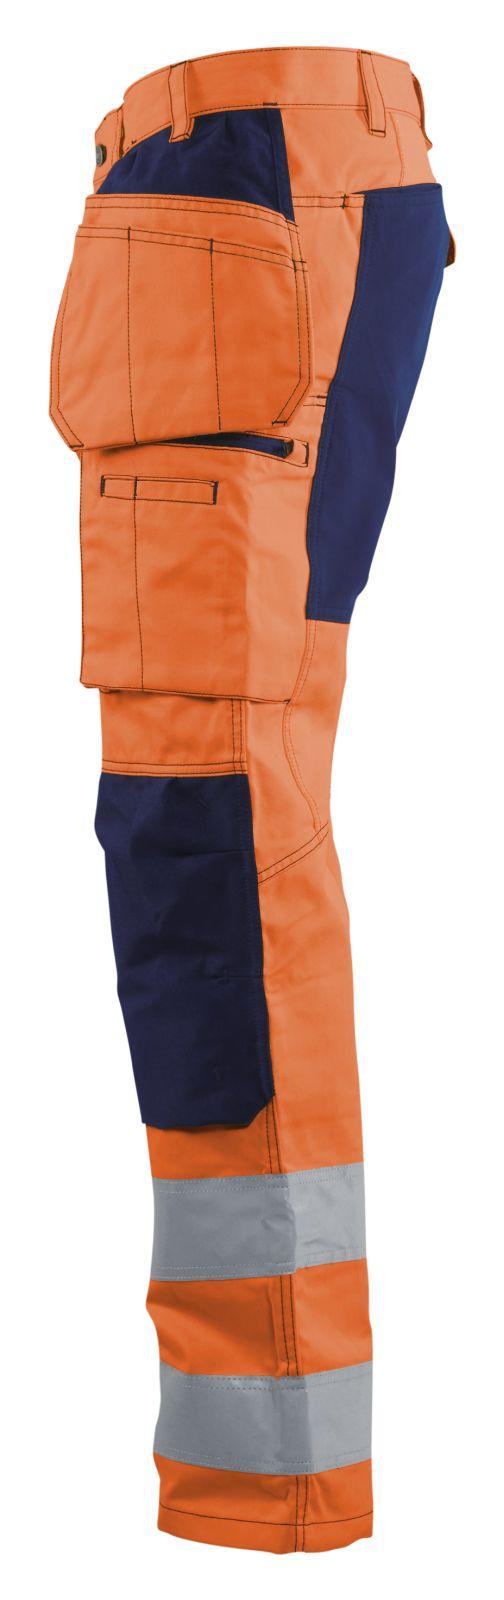 Blaklader Broeken 15521811 High Vis fluo oranje-marineblauw(5389)